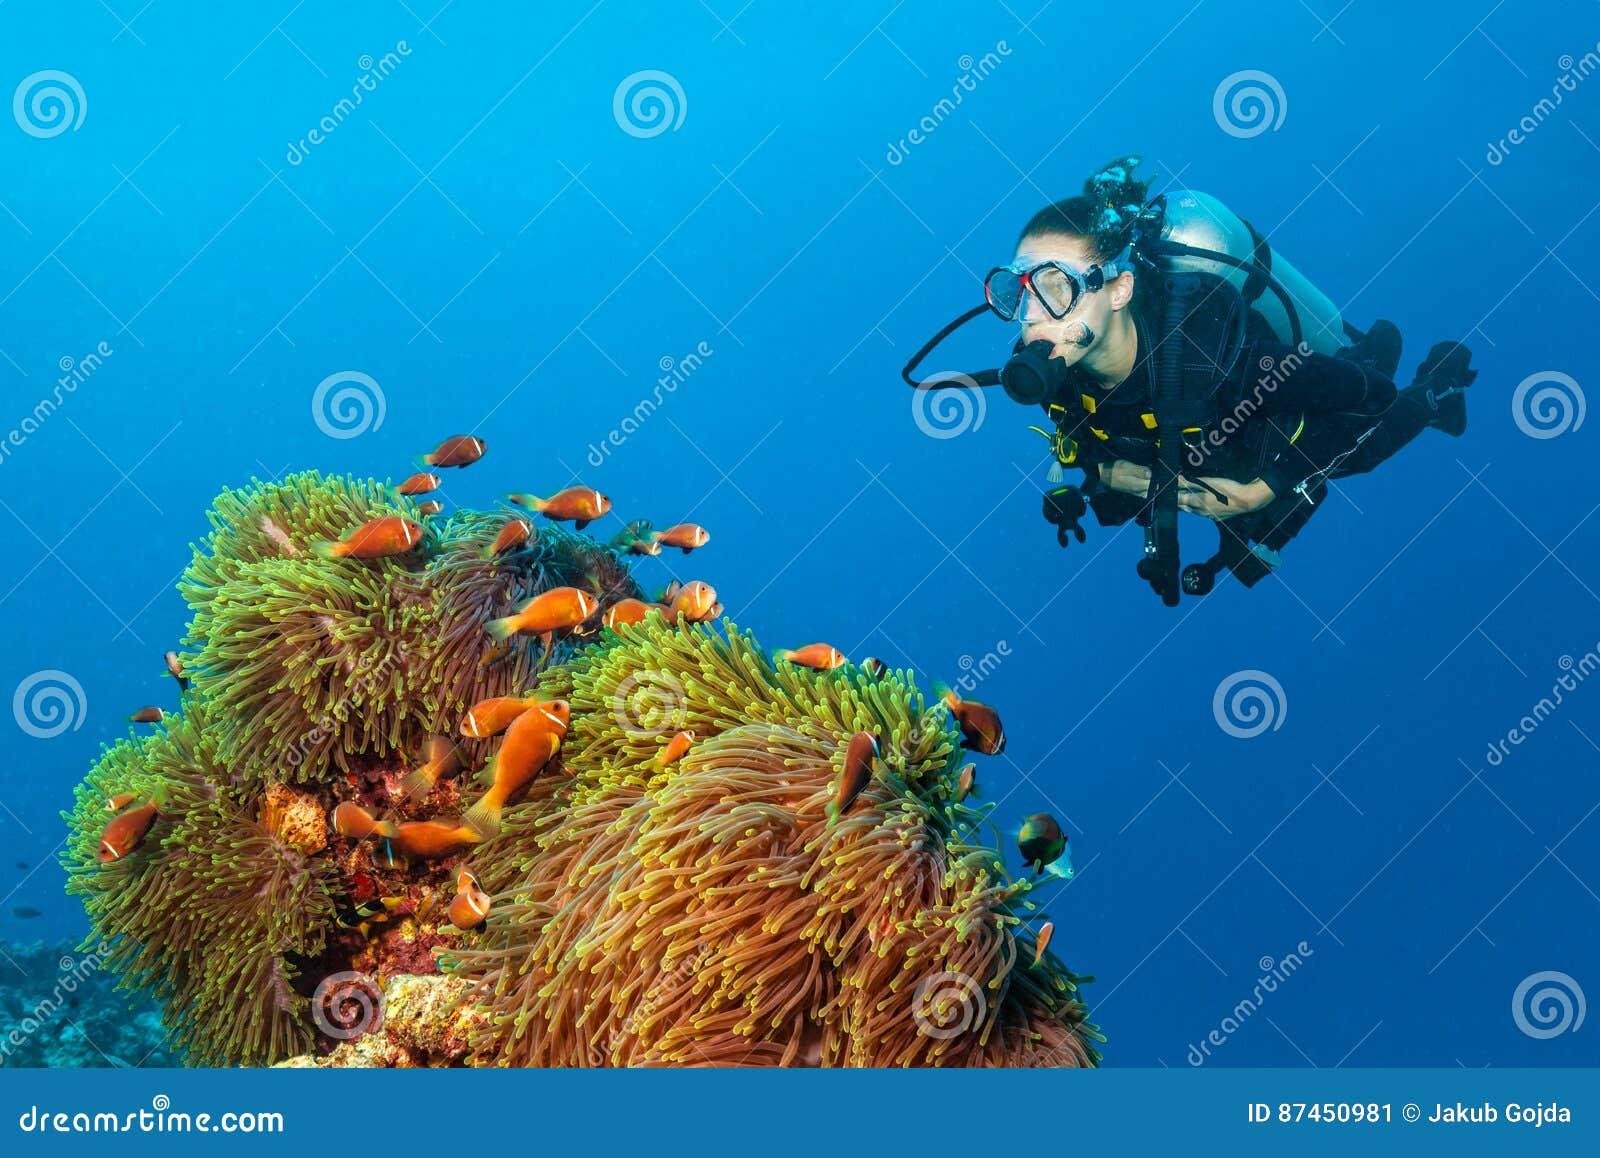 Woman scuba diver exploring claun fish